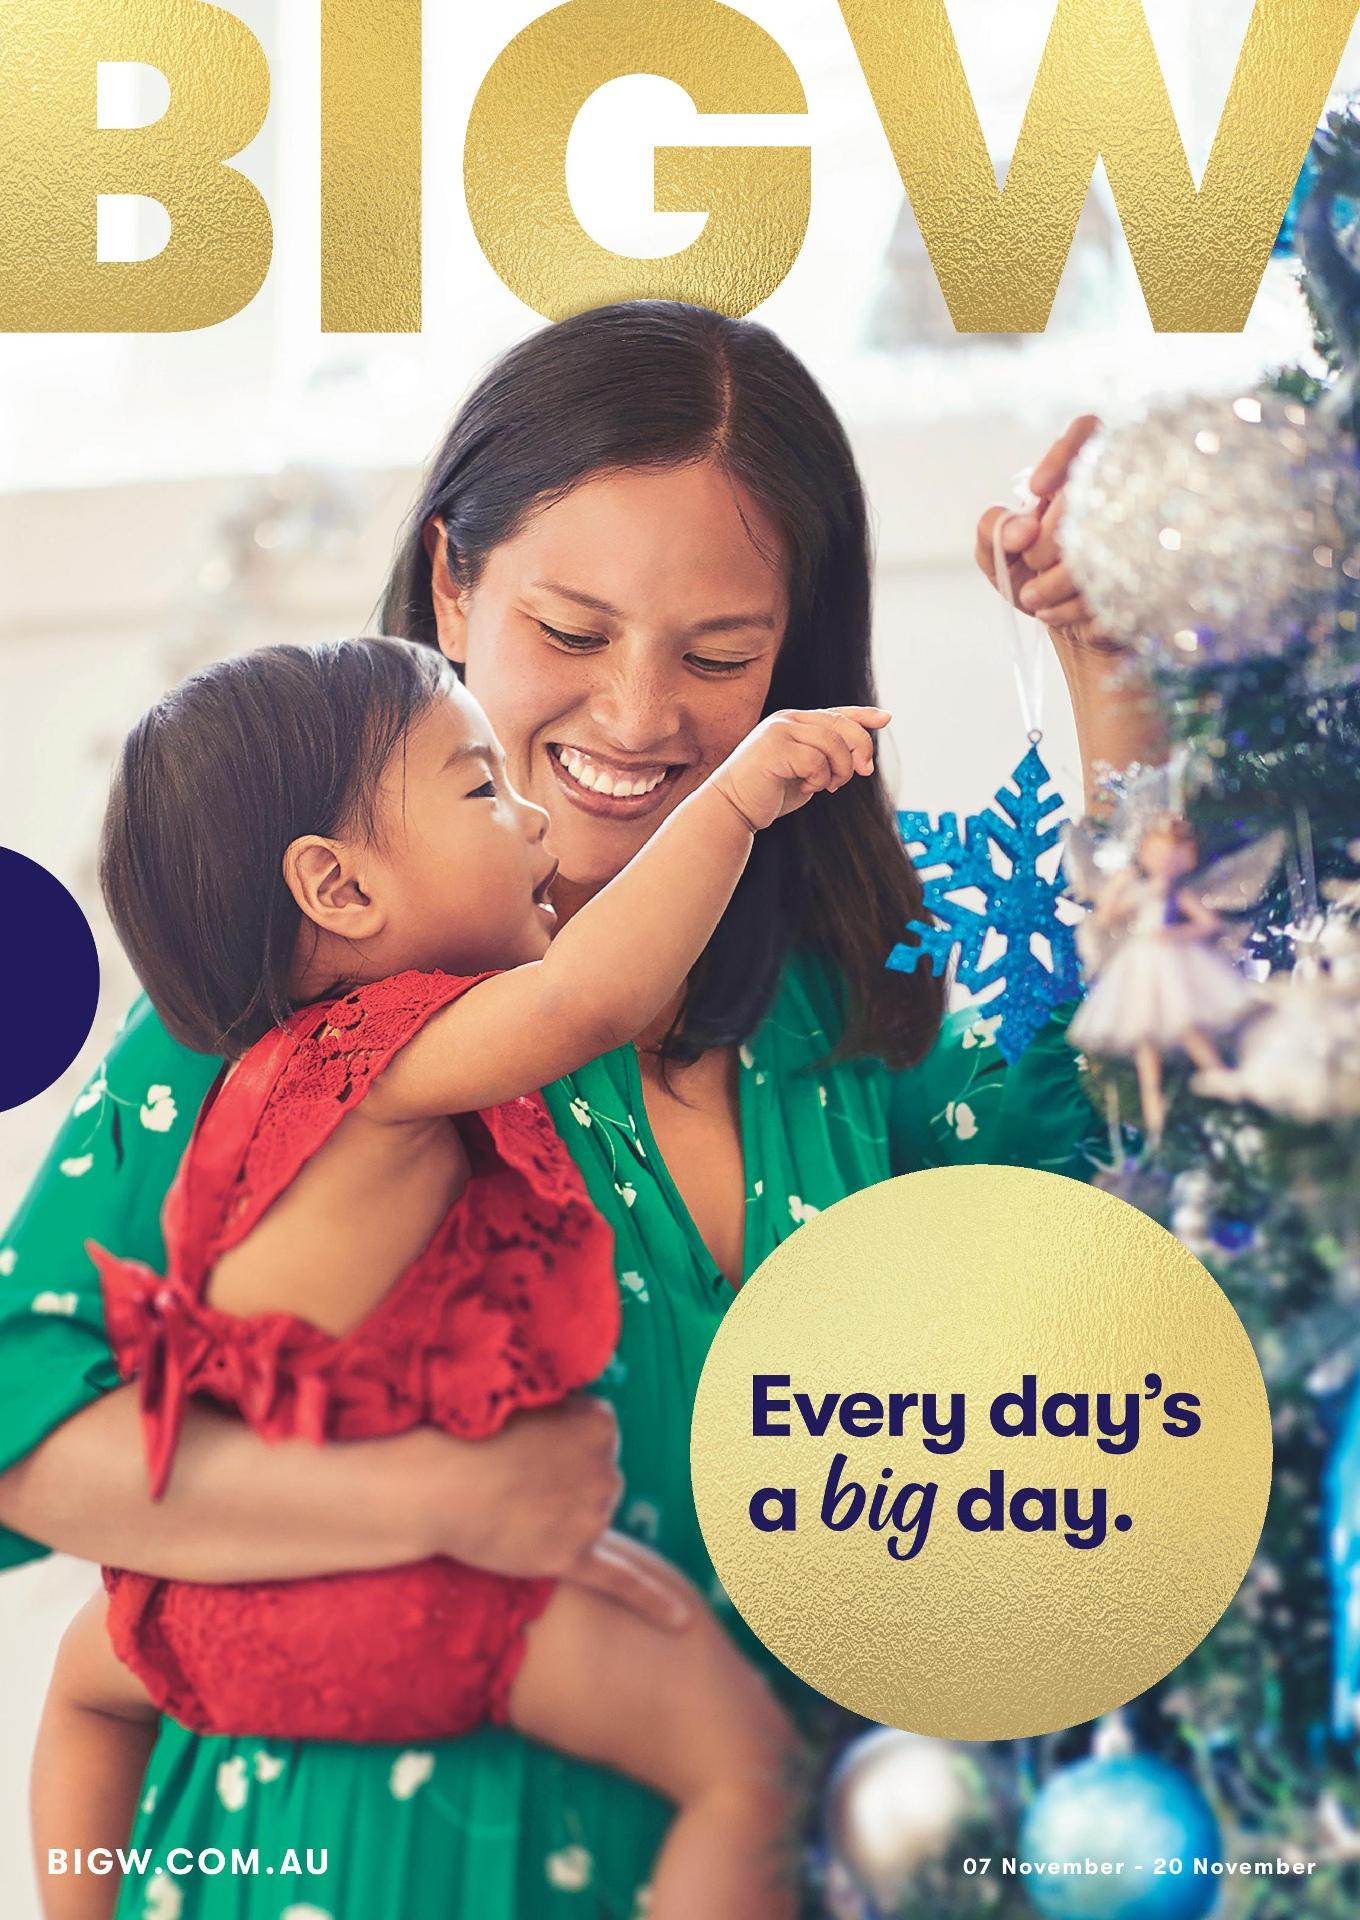 BigW Catalogue 7 November - 20 November 2019